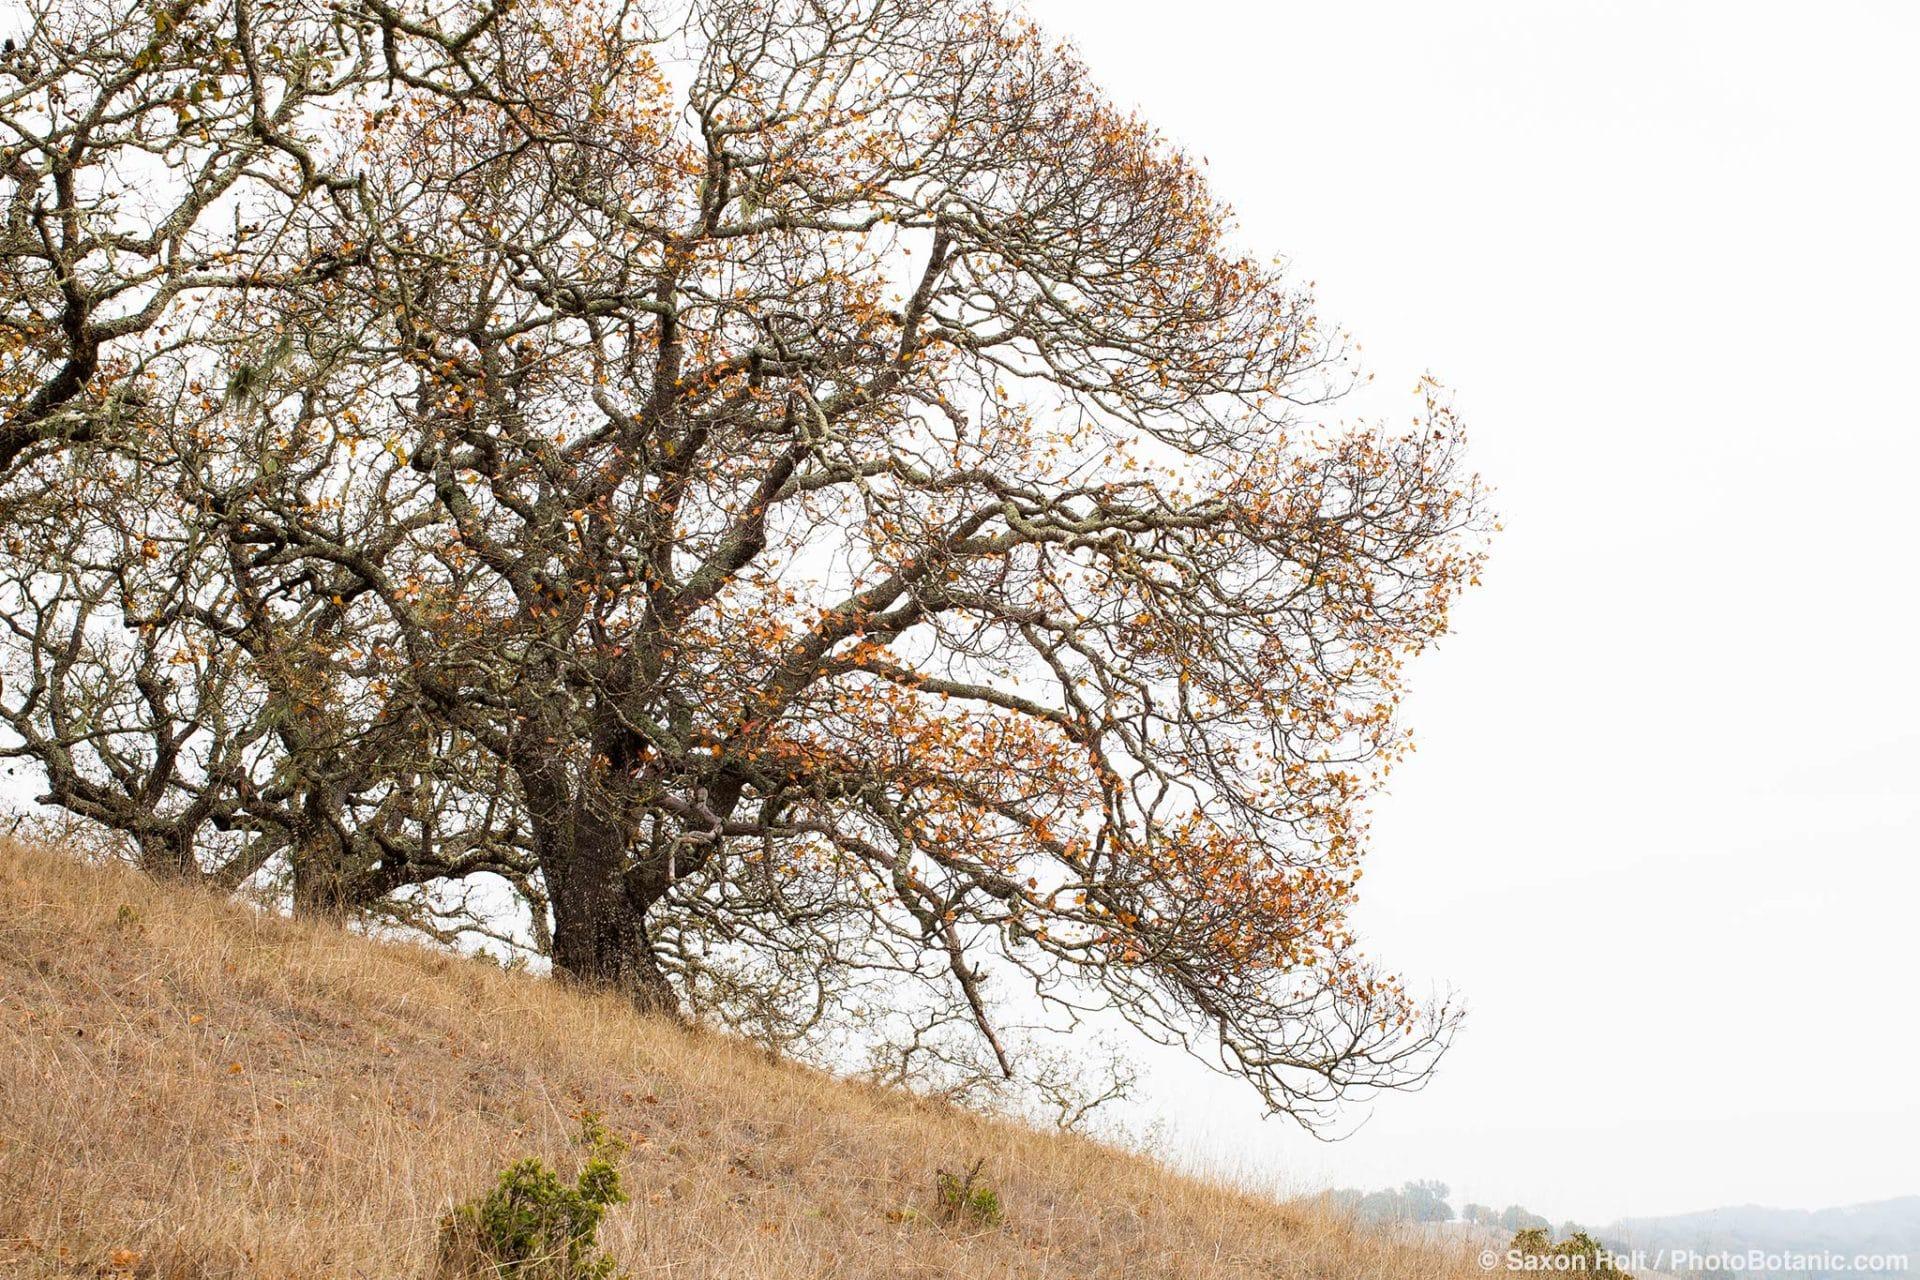 Quercus garryana, White Oak in autumn on Pinheiro Fire Road against fog sky , Rush Creek Open Space, Marin County